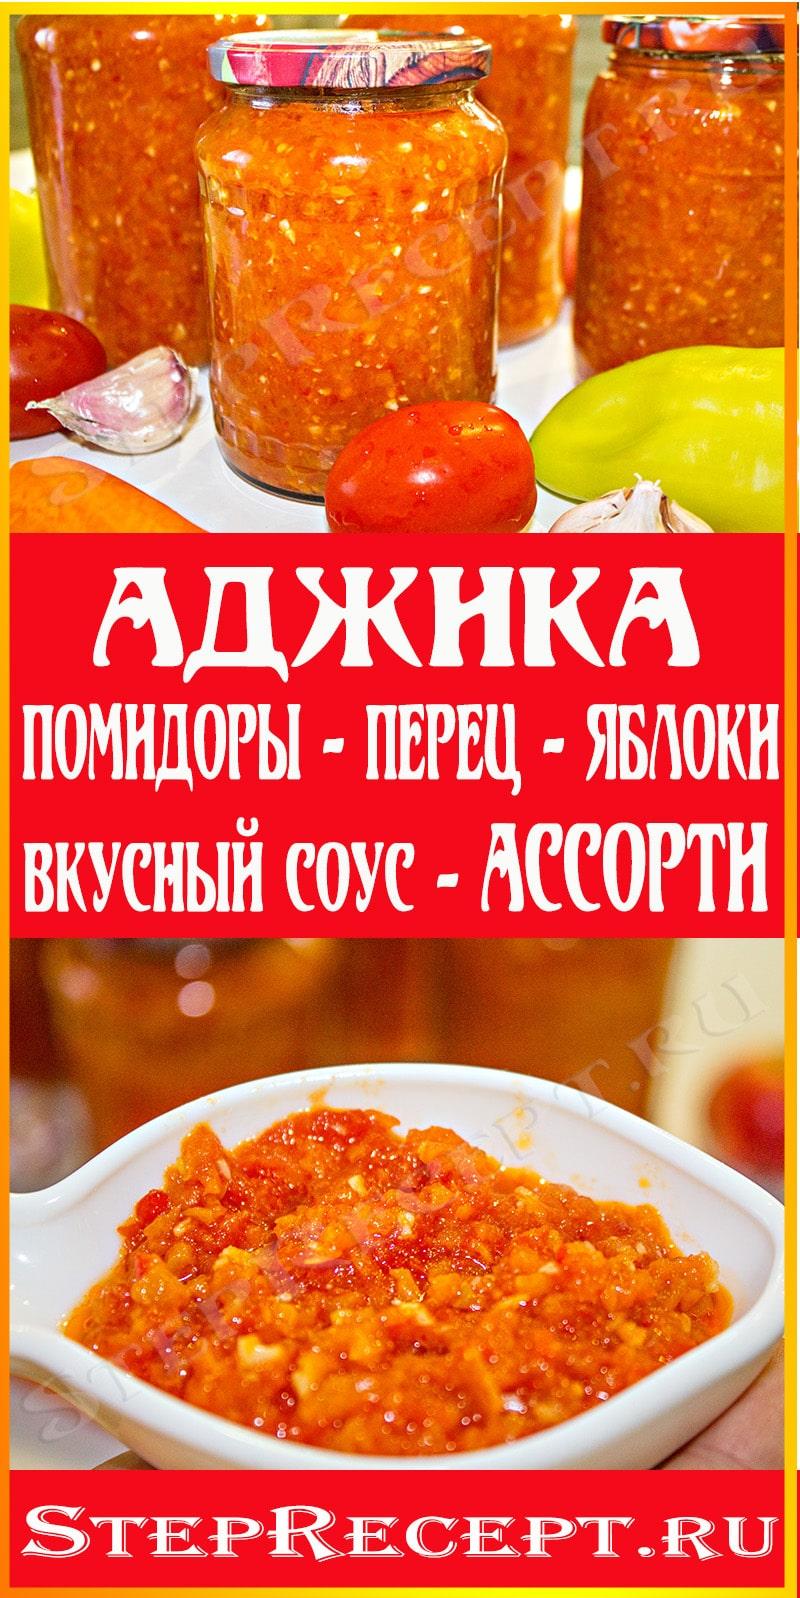 рецепт аджики из помидор и яблок